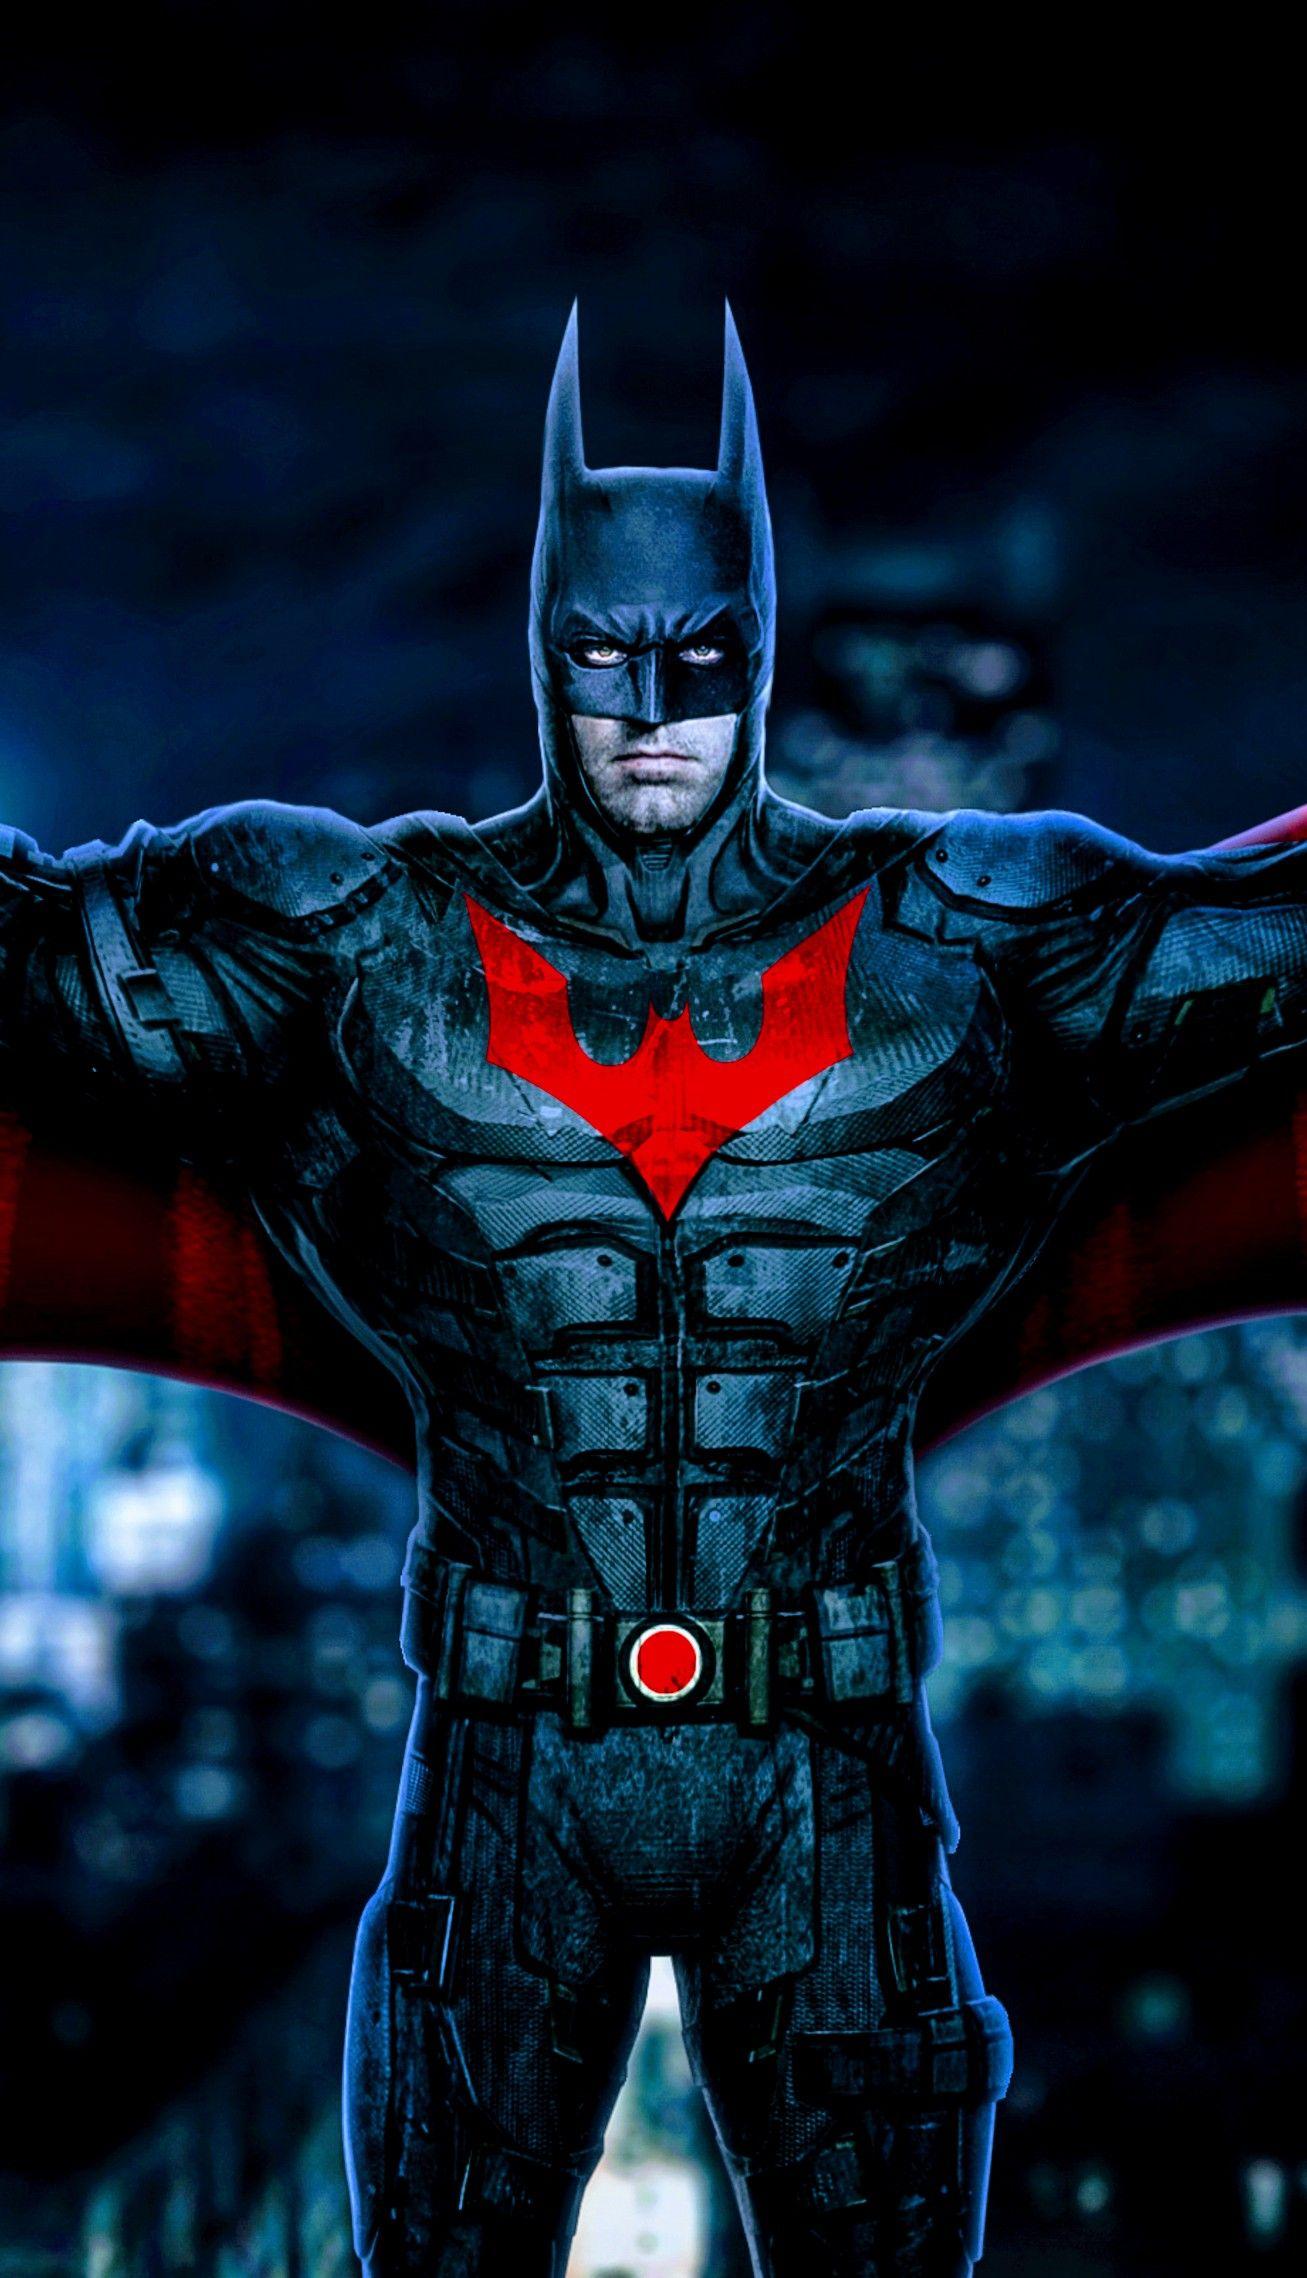 Batman Beyond Bruce Wayne Batman Wallpaper Mobile Wallpaper Iphone Iphone Wallpaper